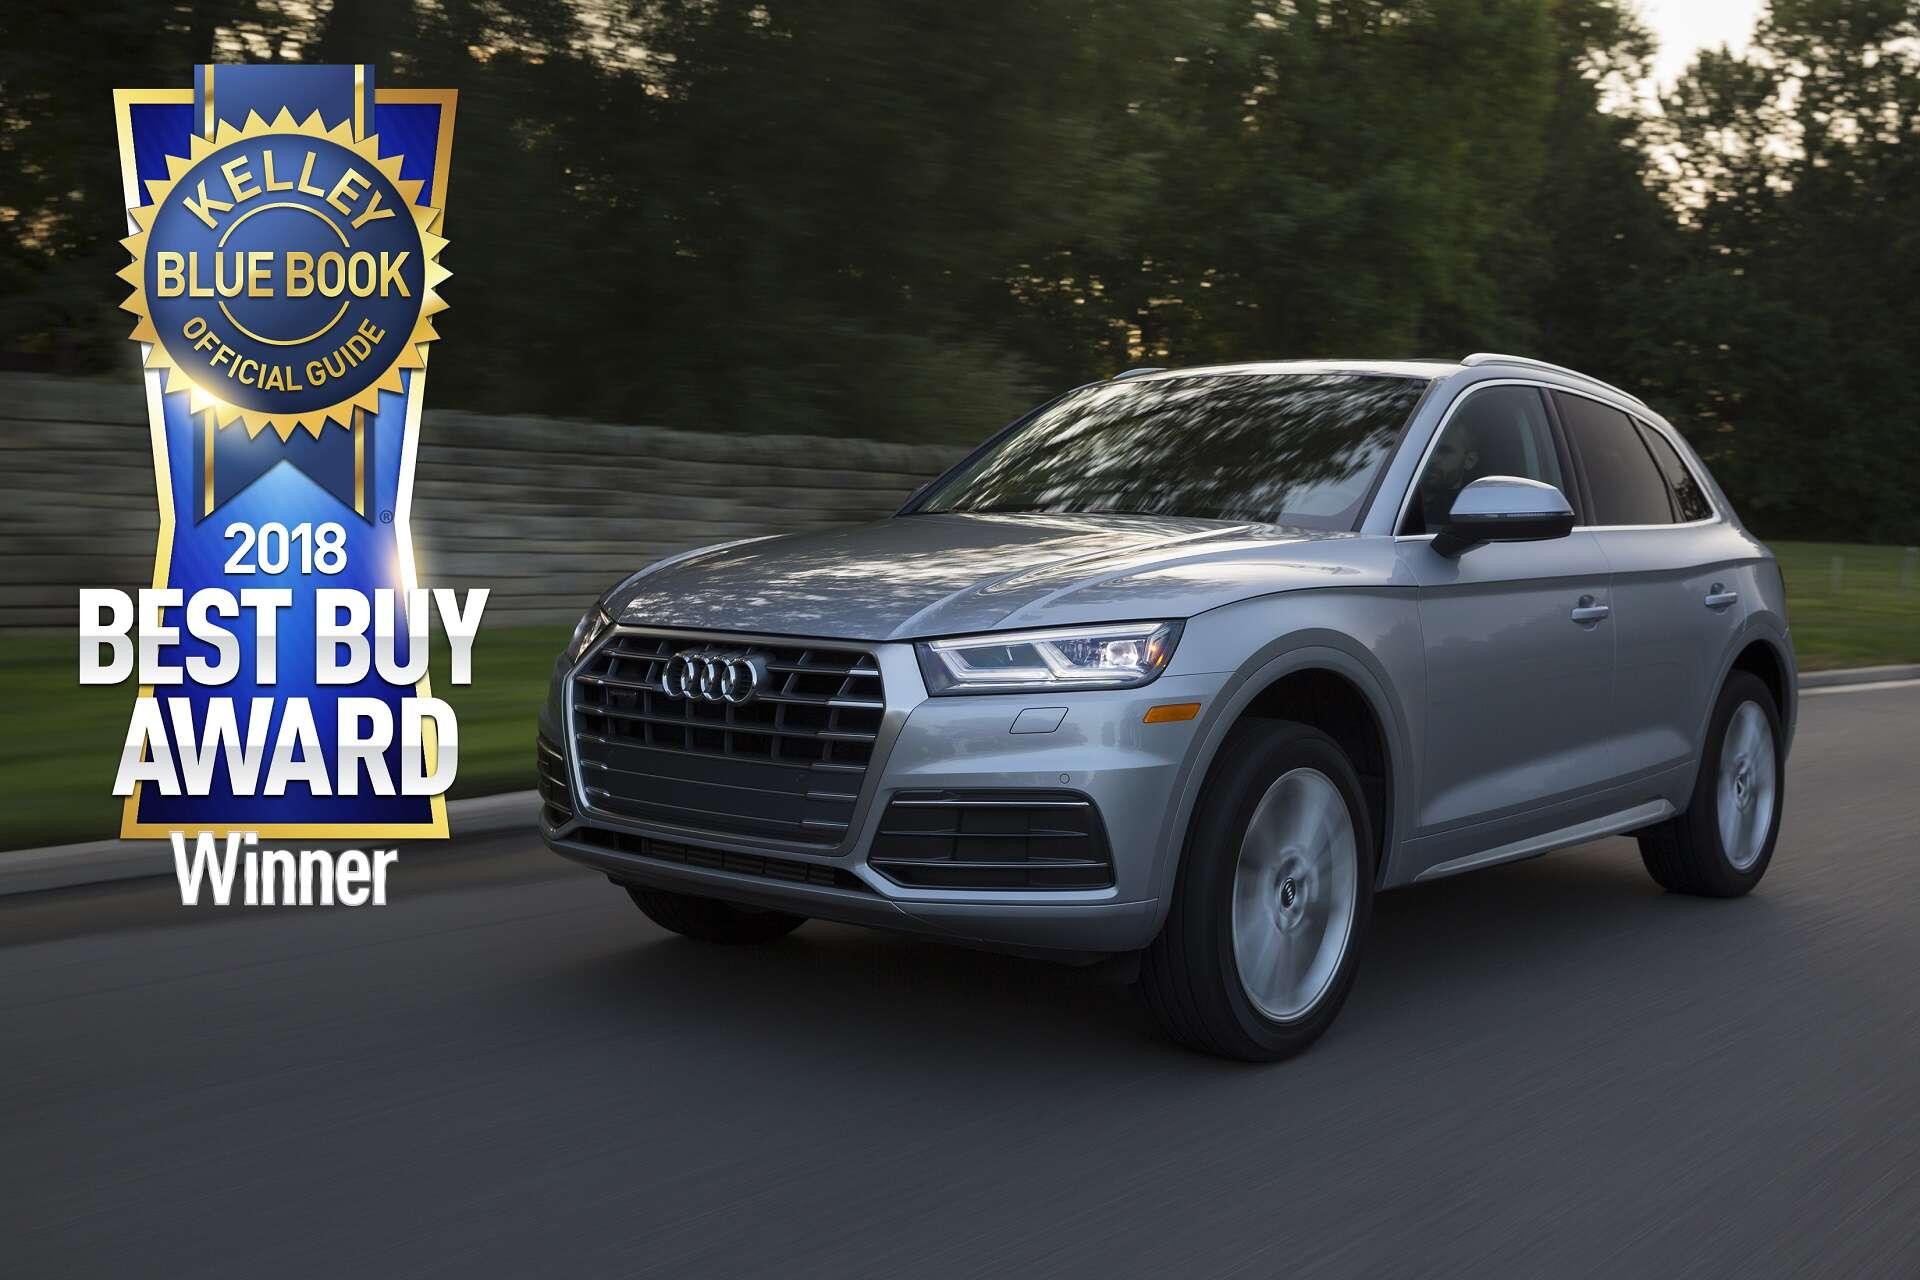 Kelley Blue Book Names Audi A5, Q5 Among Best Buy Award Winners ...